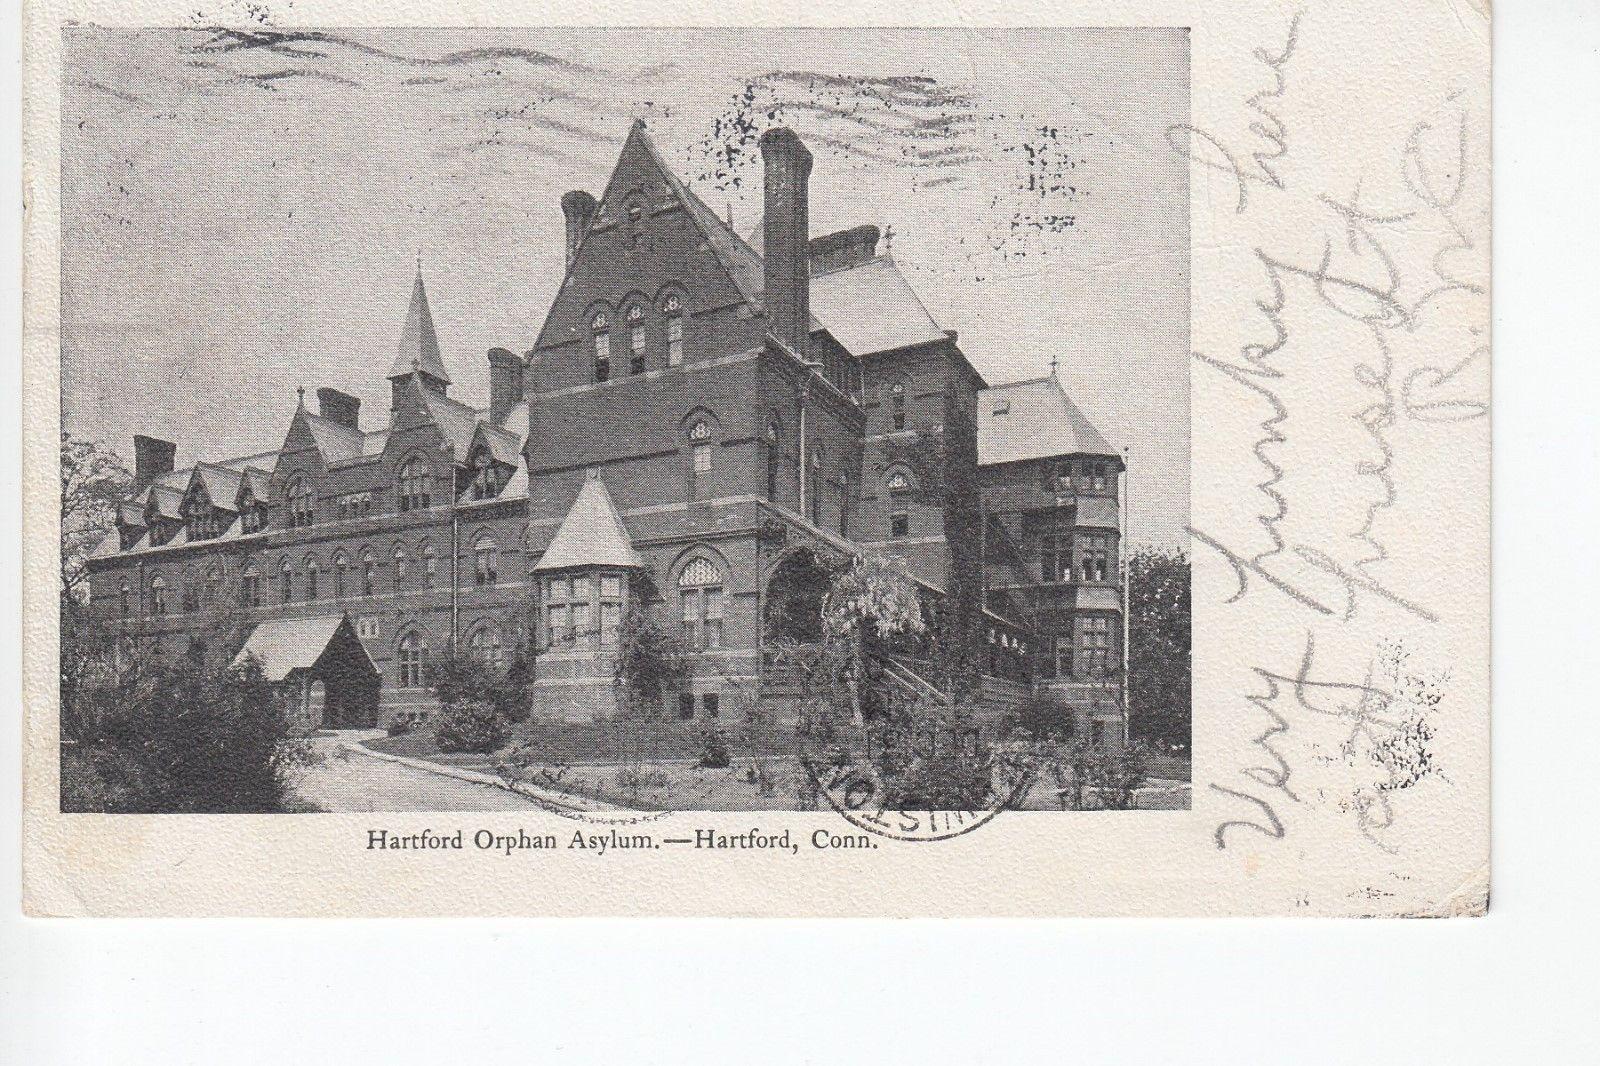 History by dennis sullivan on my hartfordct history